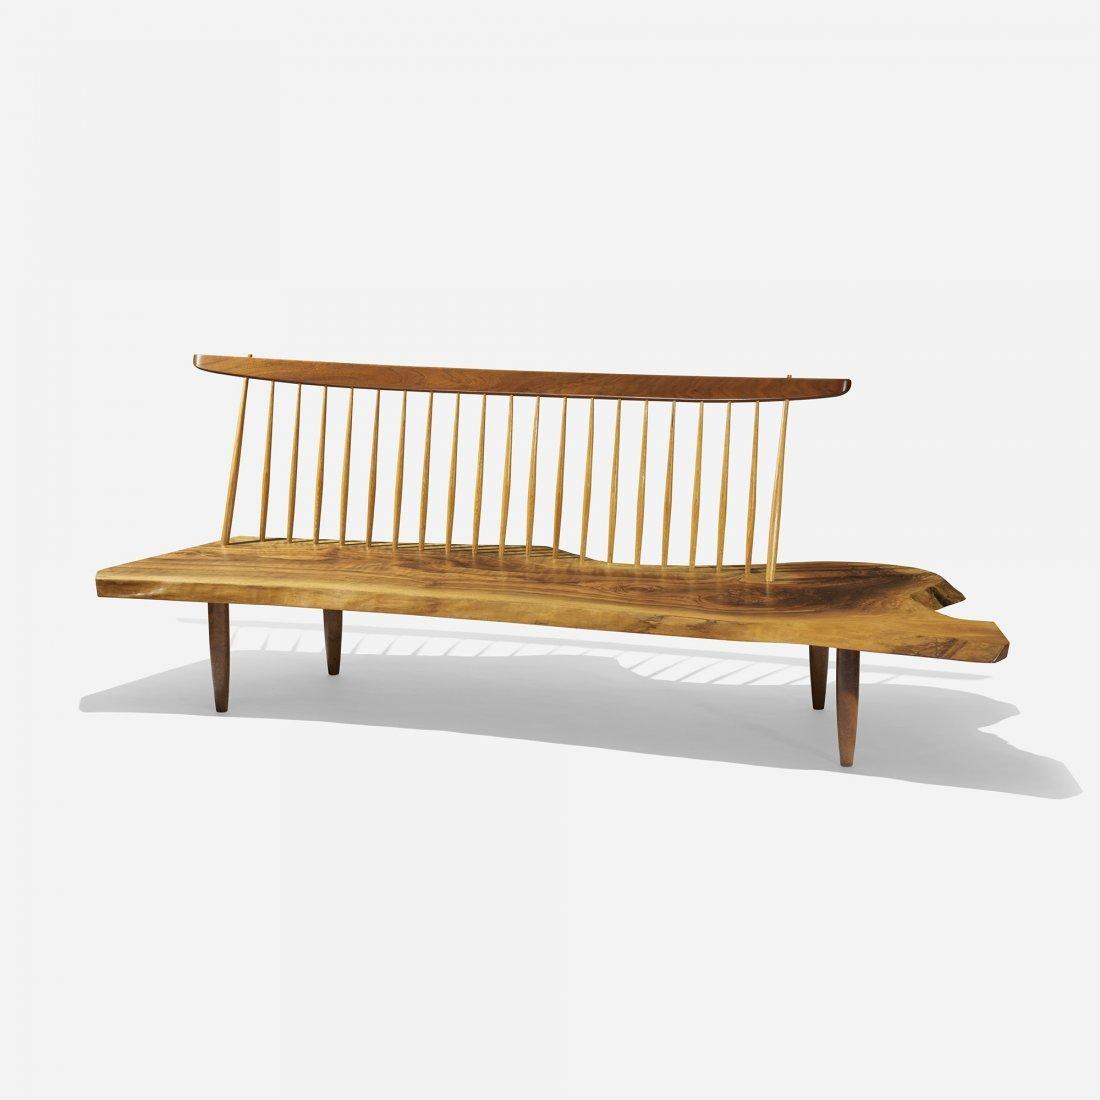 George Nakashima Conoid bench with spindle back